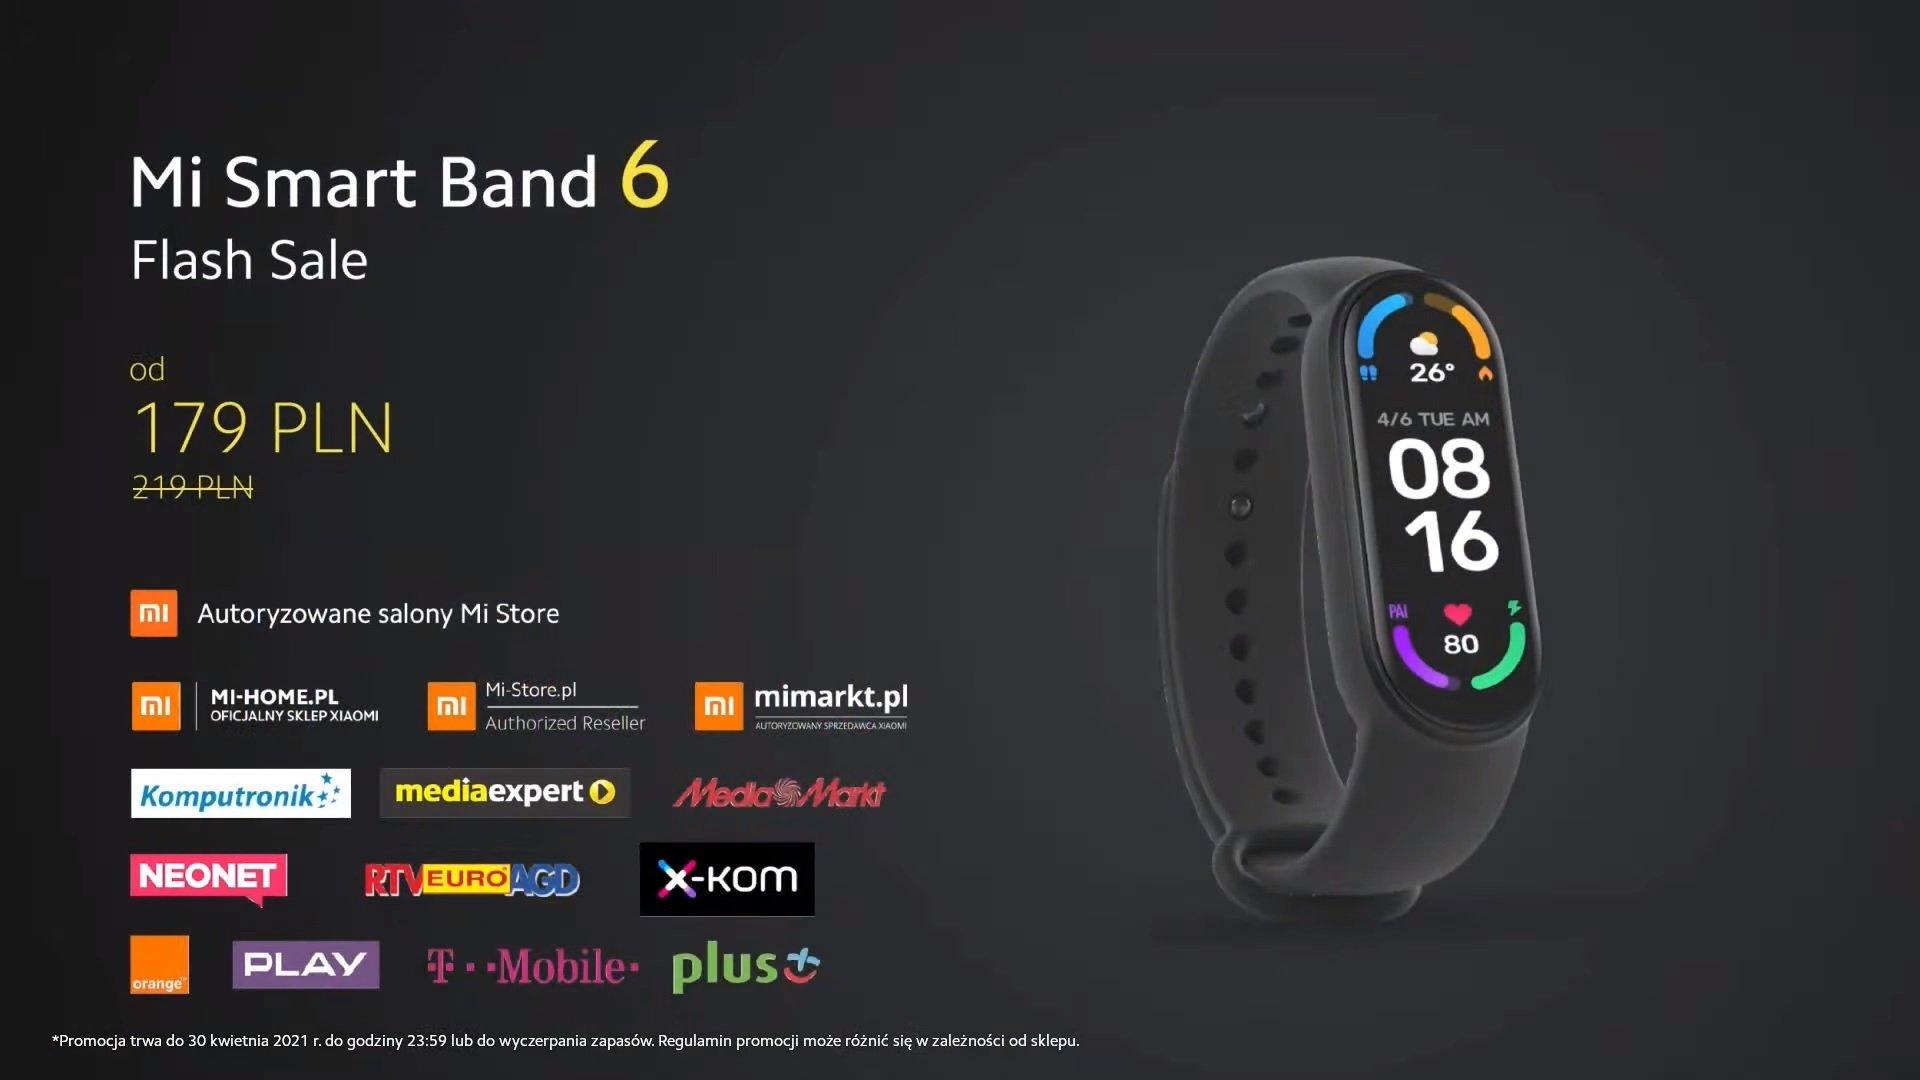 Xiaomi Mi Smart Band 6 flash sale